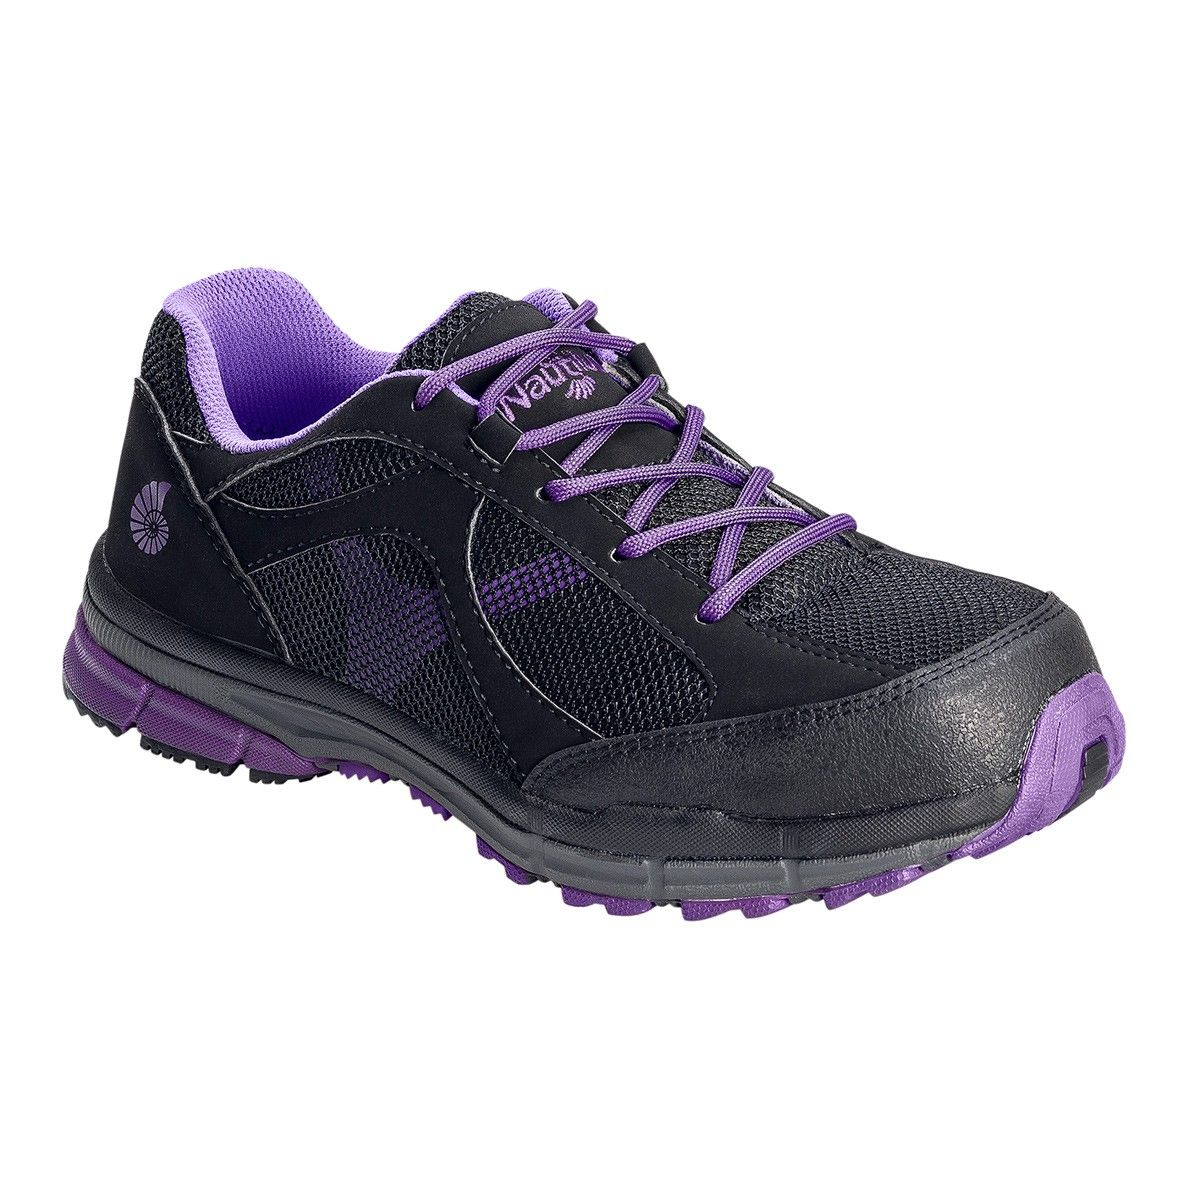 Nautilus Womens Steel Toe ESD Shoe N1781 Shoes, Work